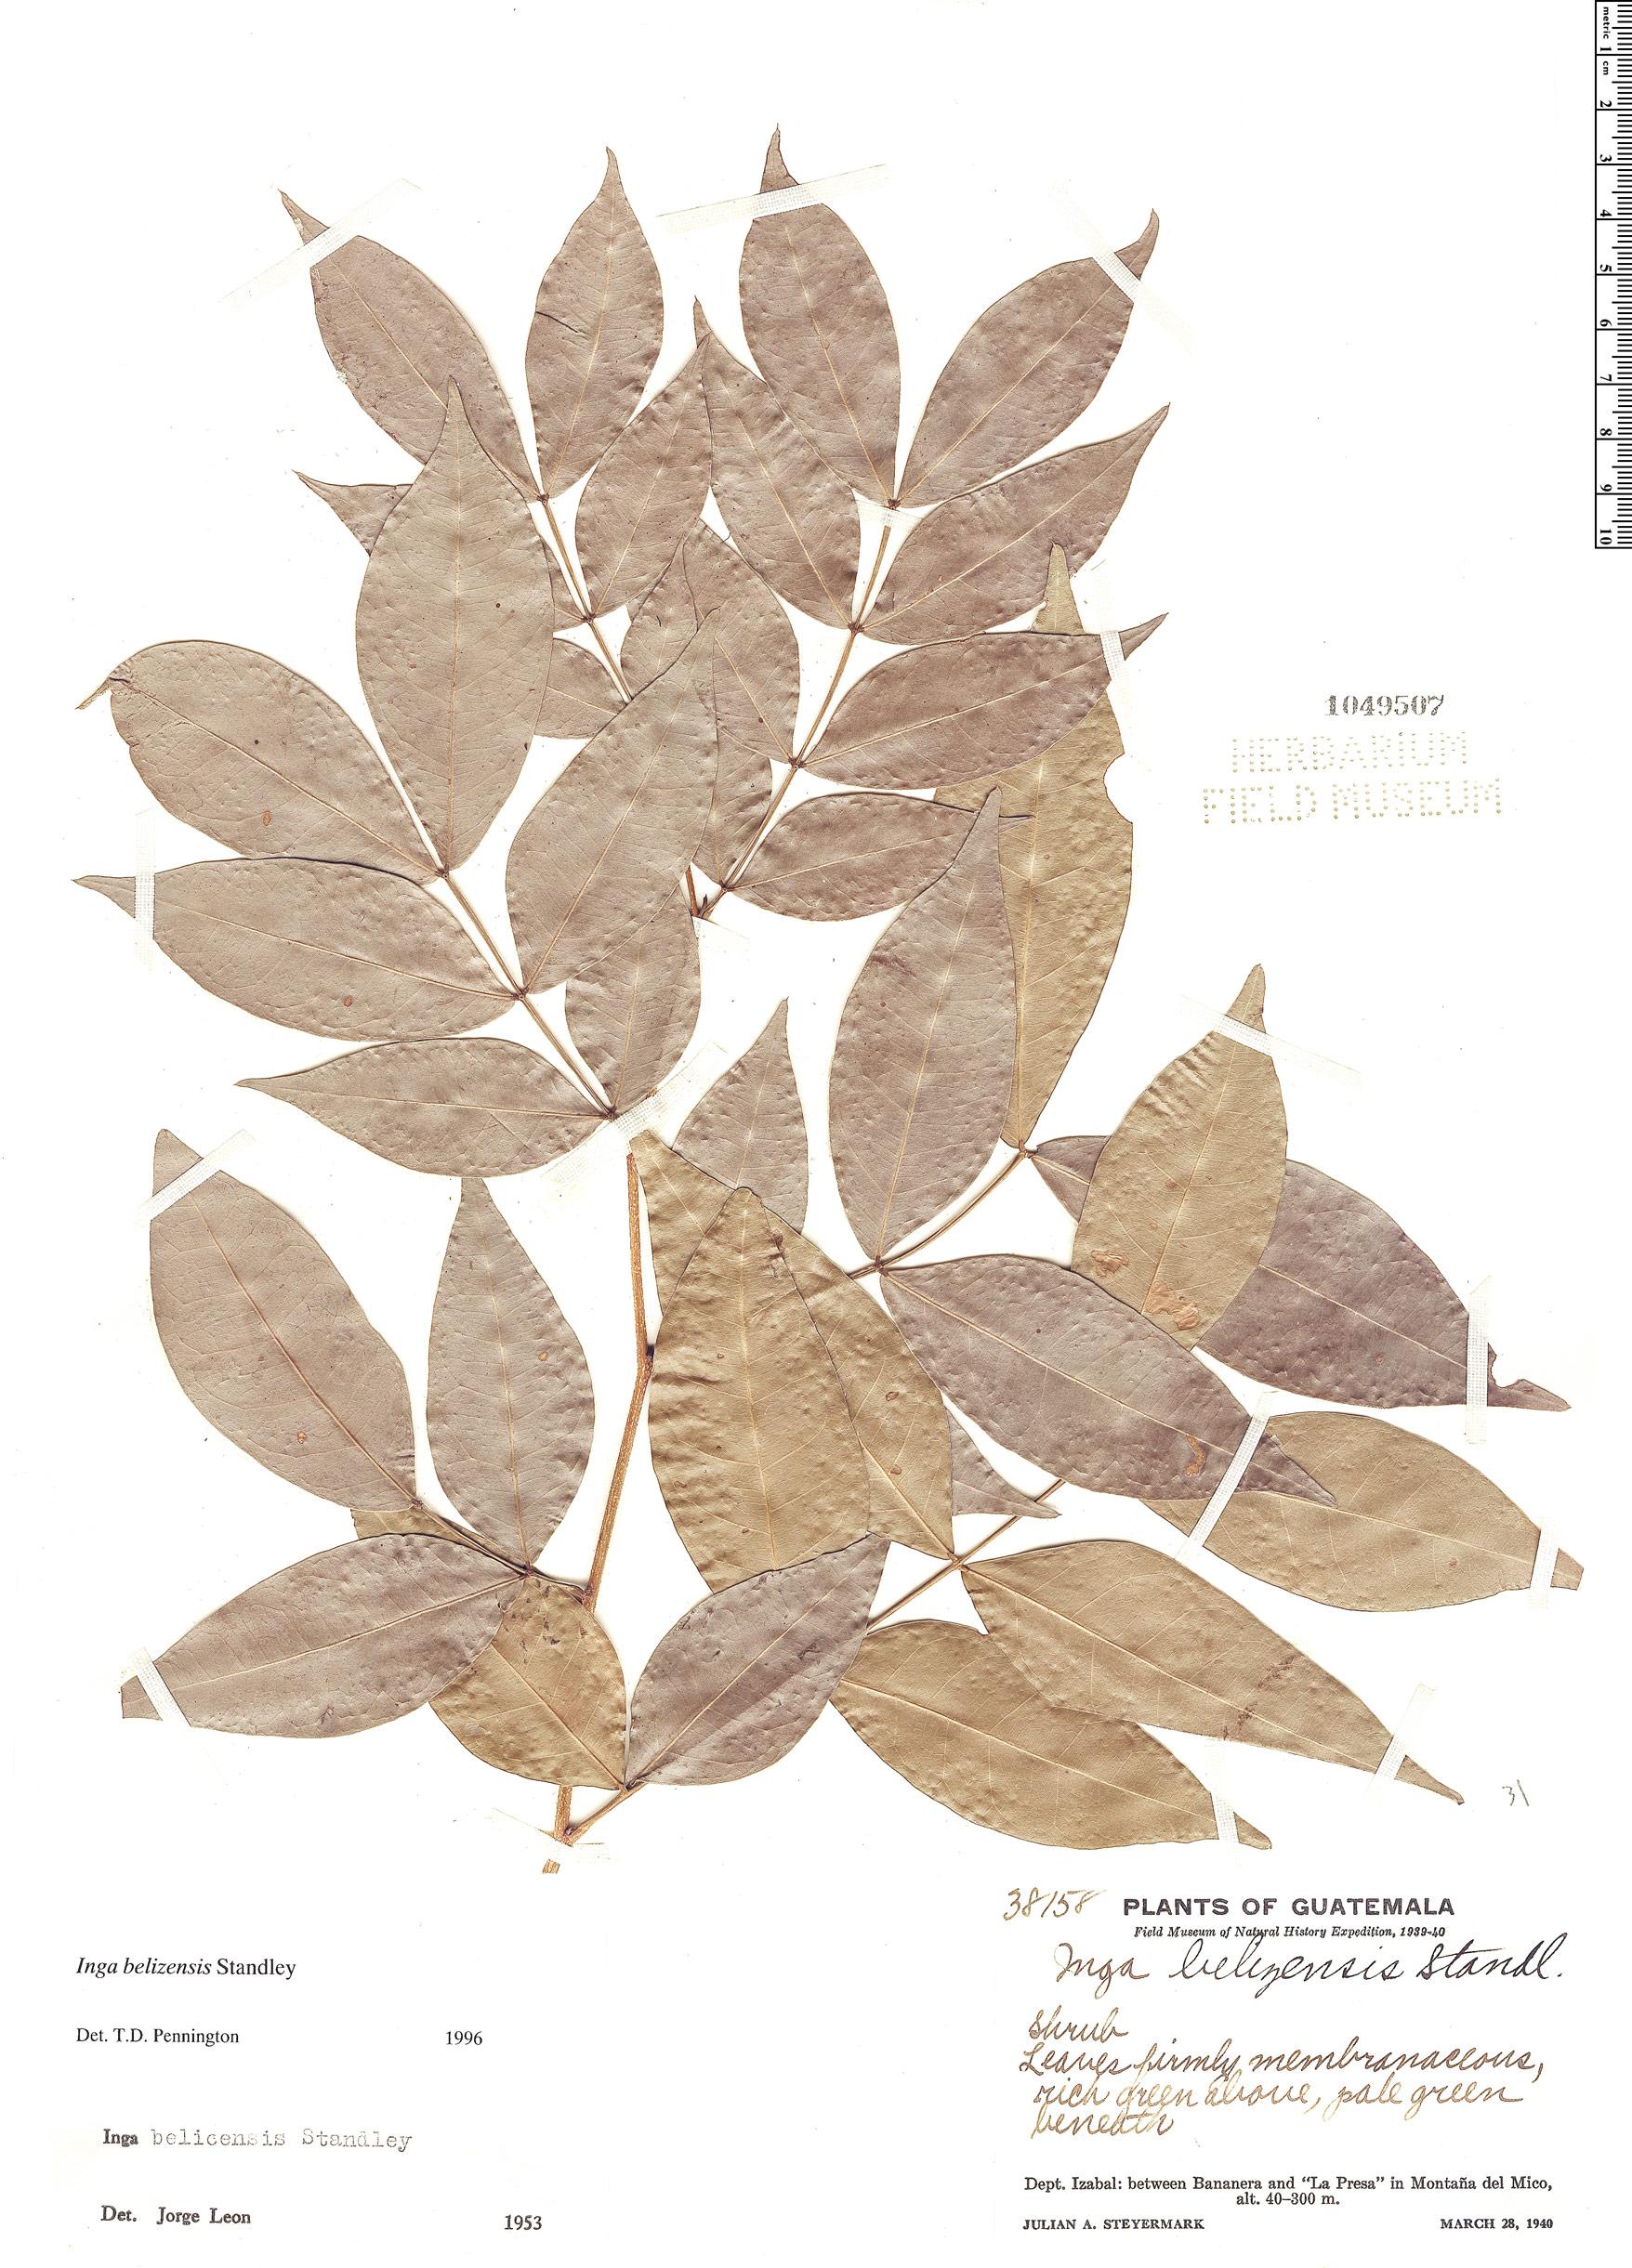 Specimen: Inga belizensis